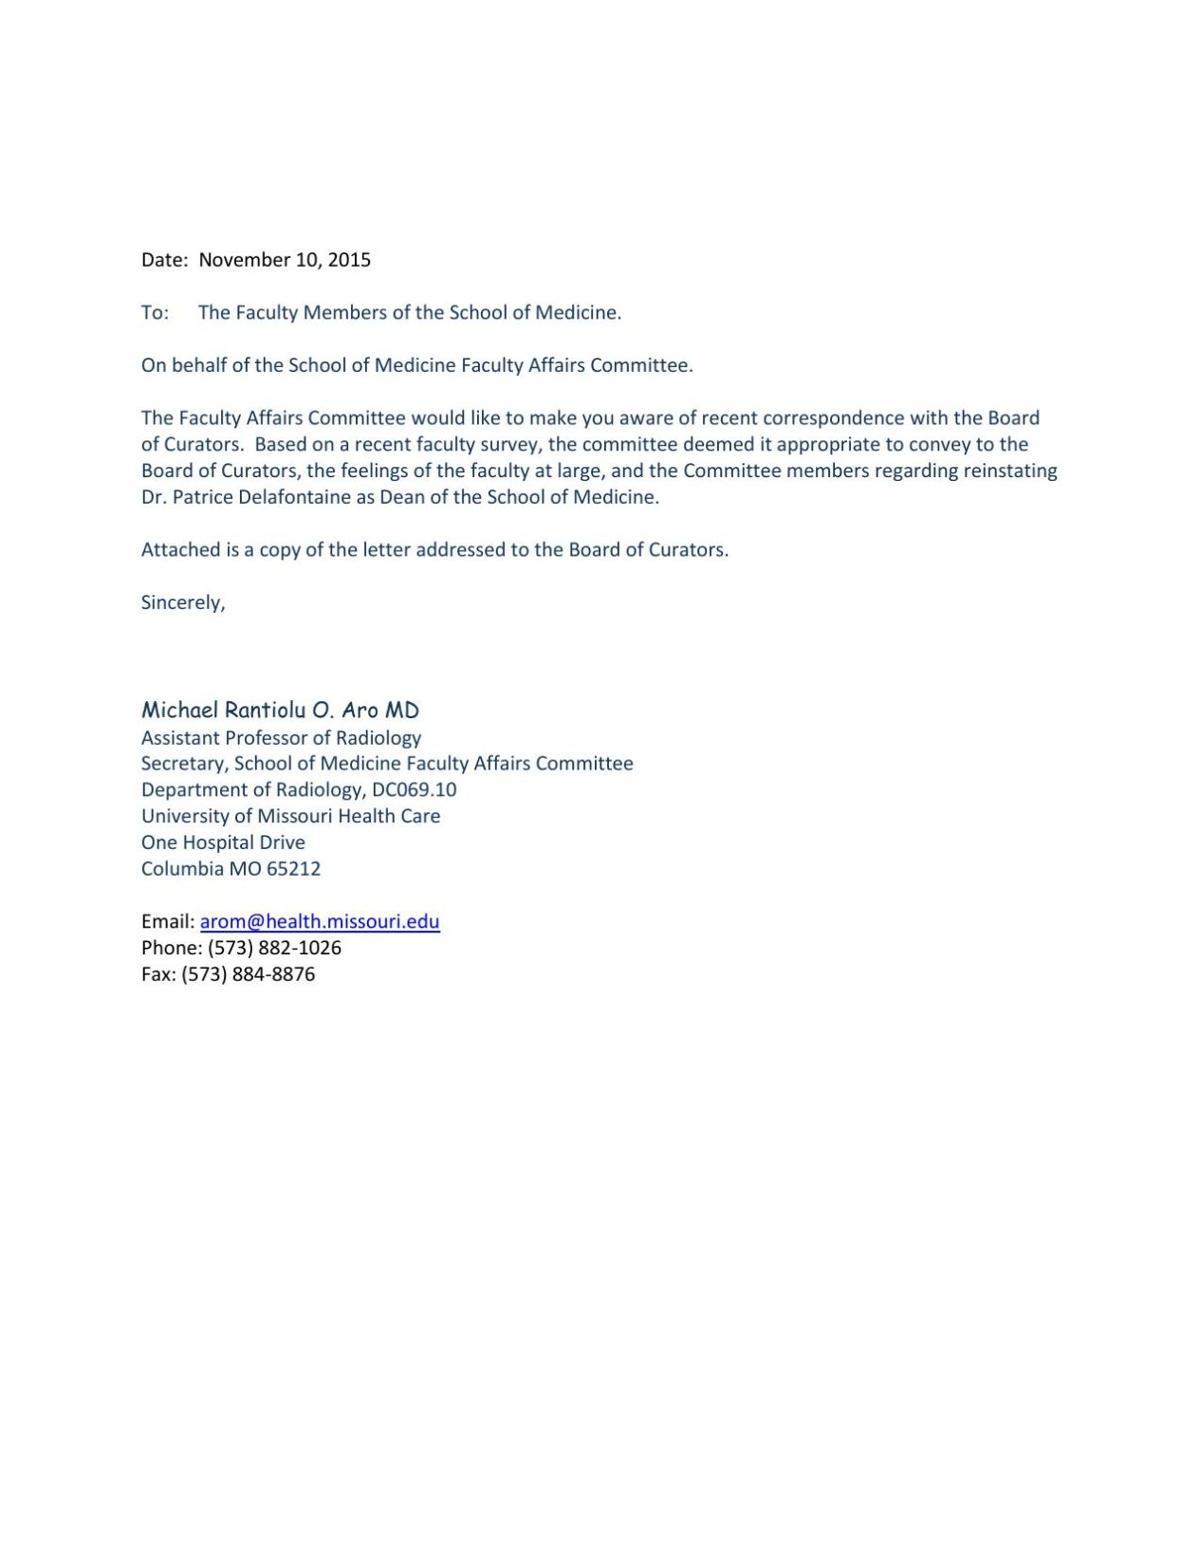 Faculty Call For Former Mu School Of Medicine Deans Reinstatement